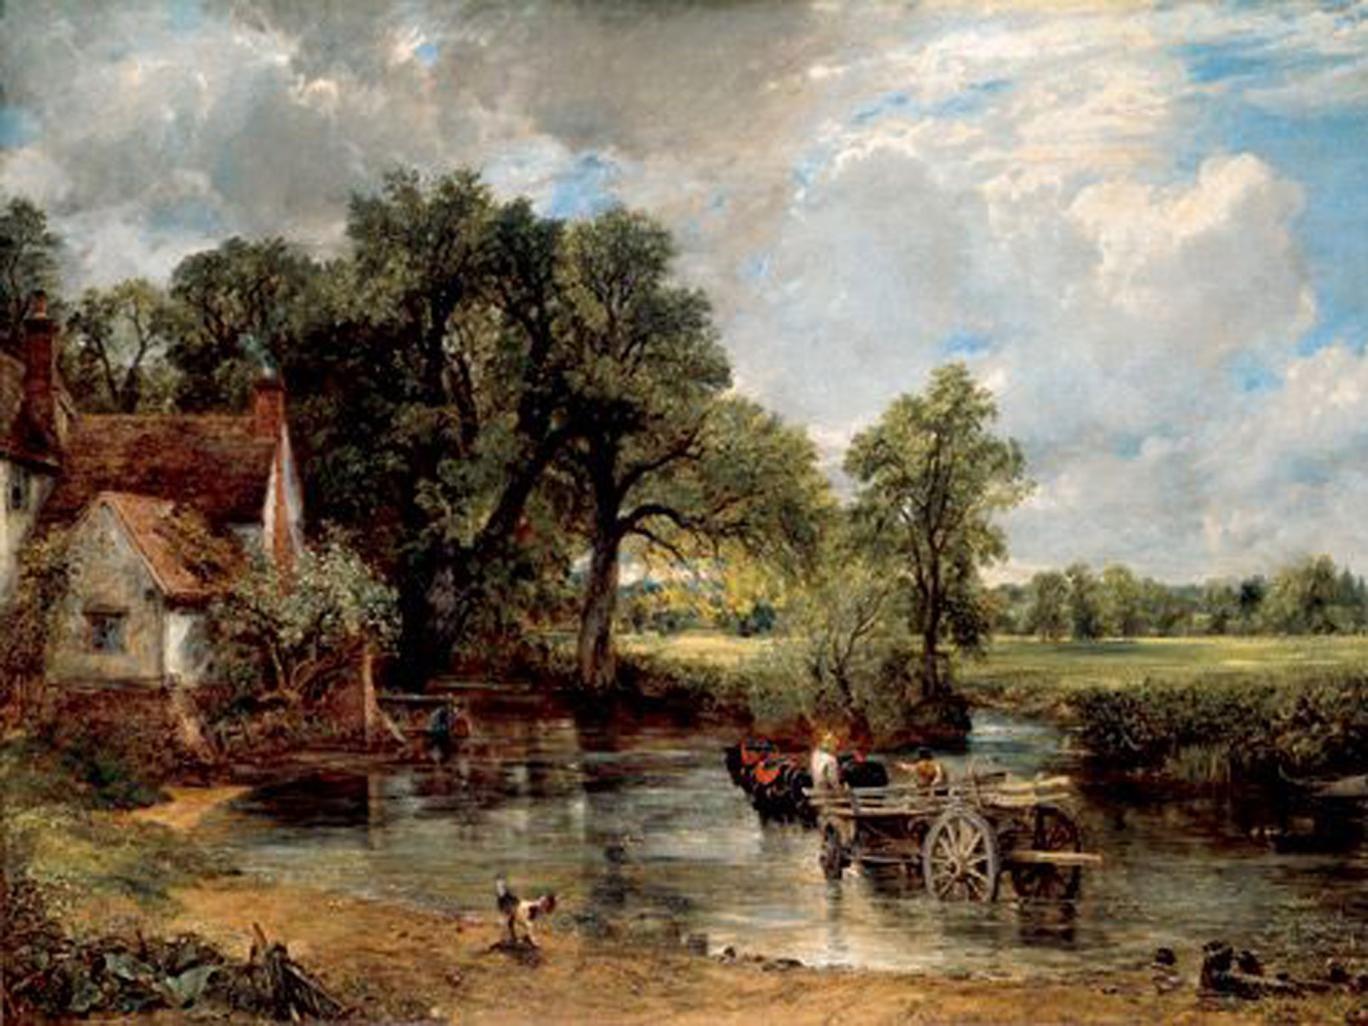 Constable's The Hay Wain